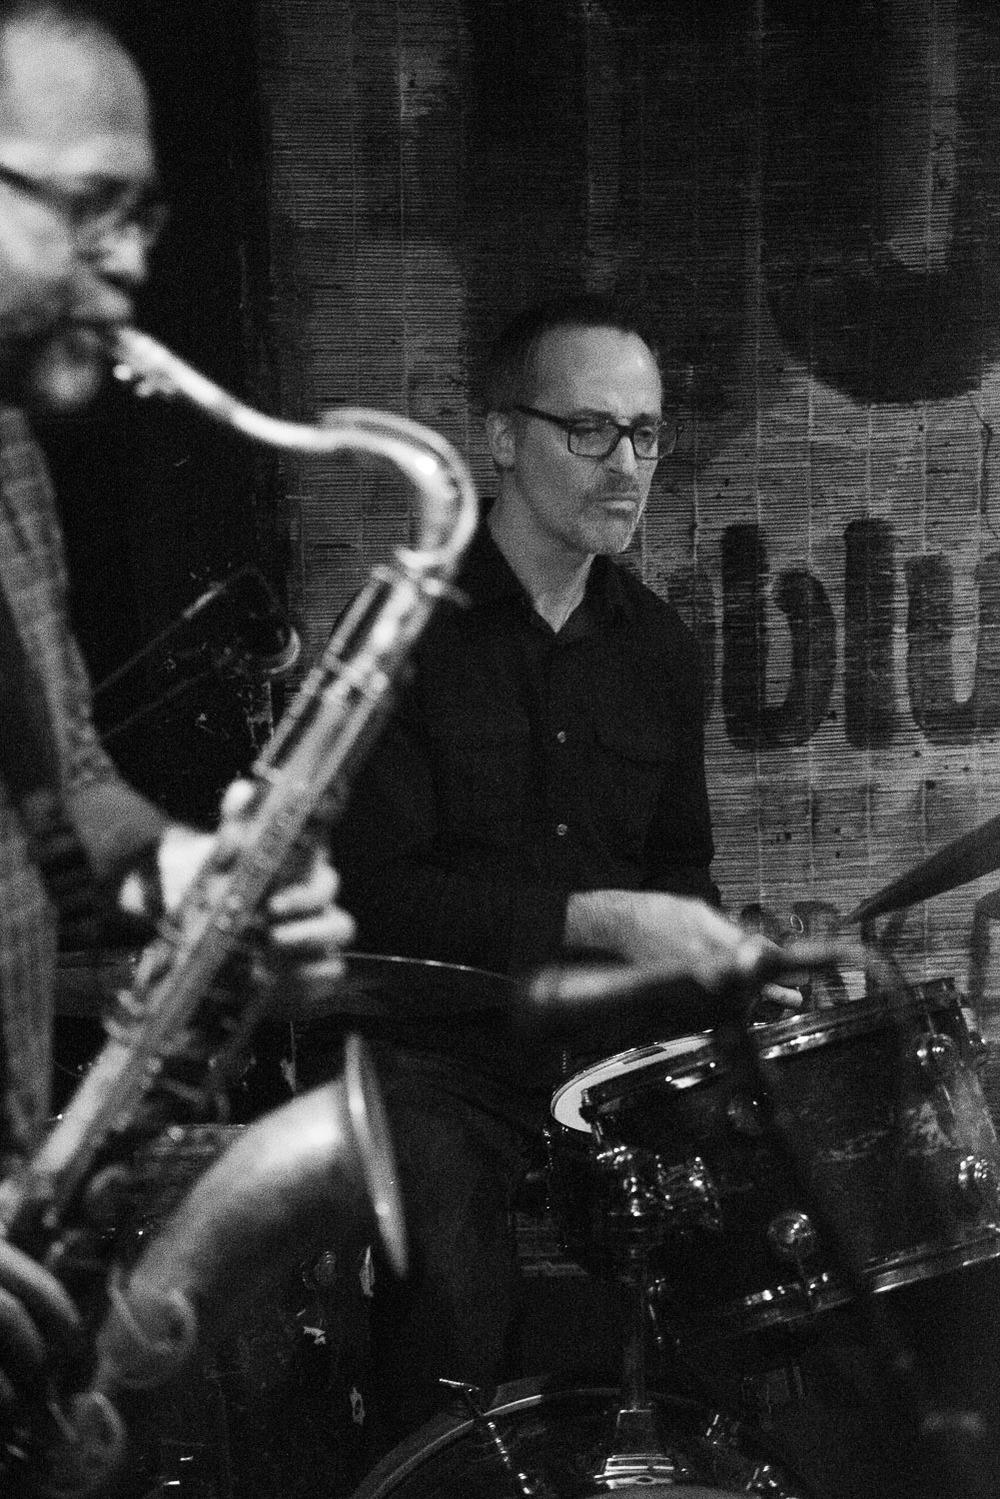 Michael Blake and Michael Sarin, 2015